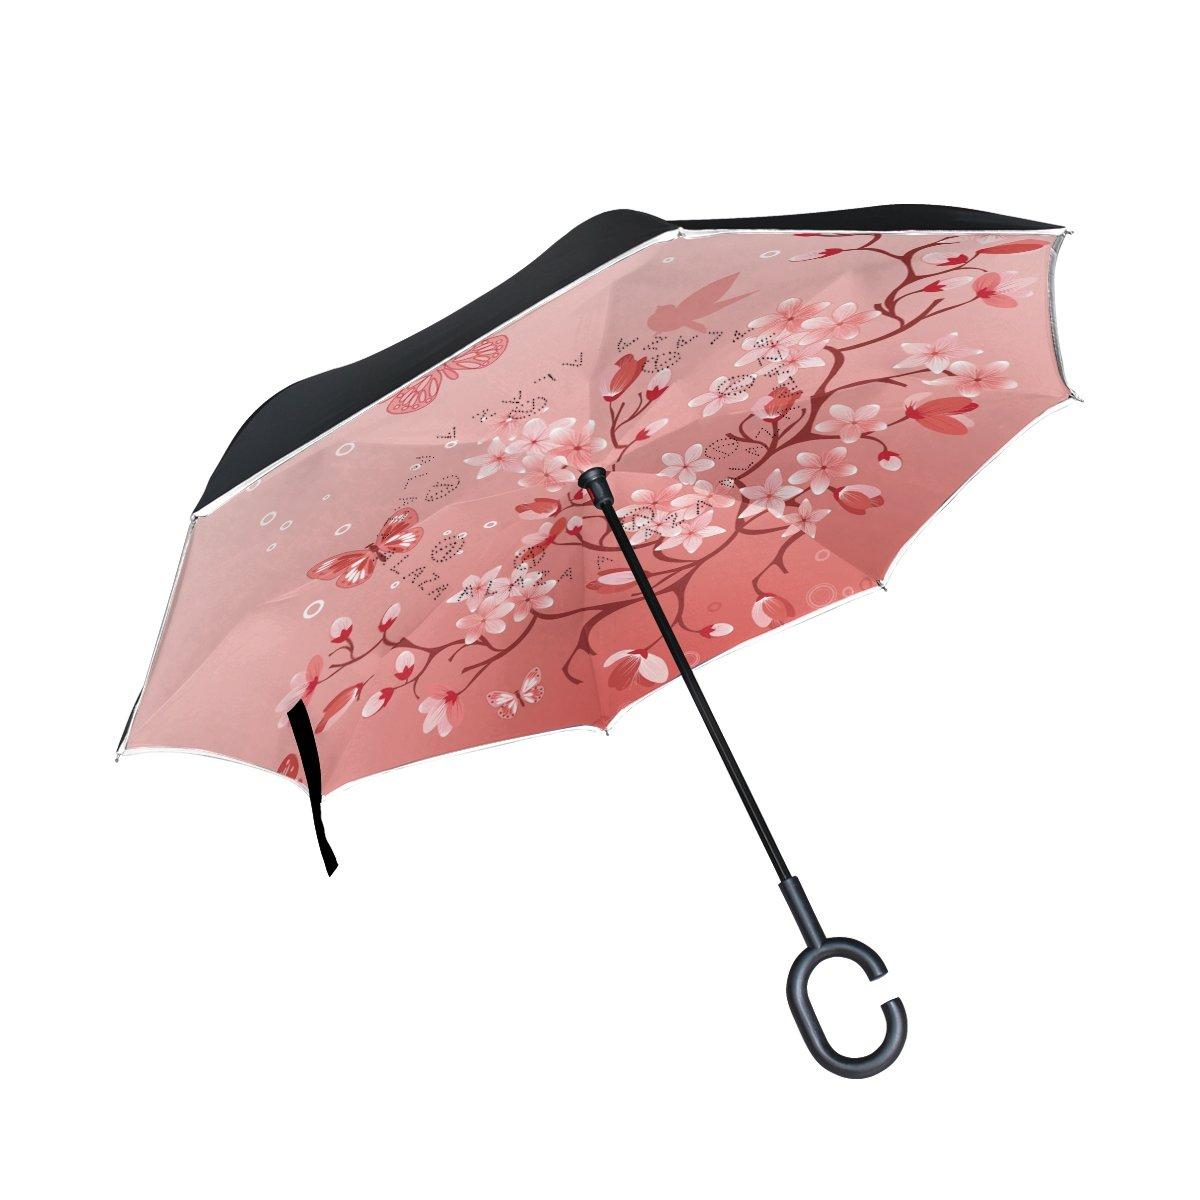 c7575ef4843e Amazon.com: Japanese Sakura Cherry Blossom Inverted Double Layer ...